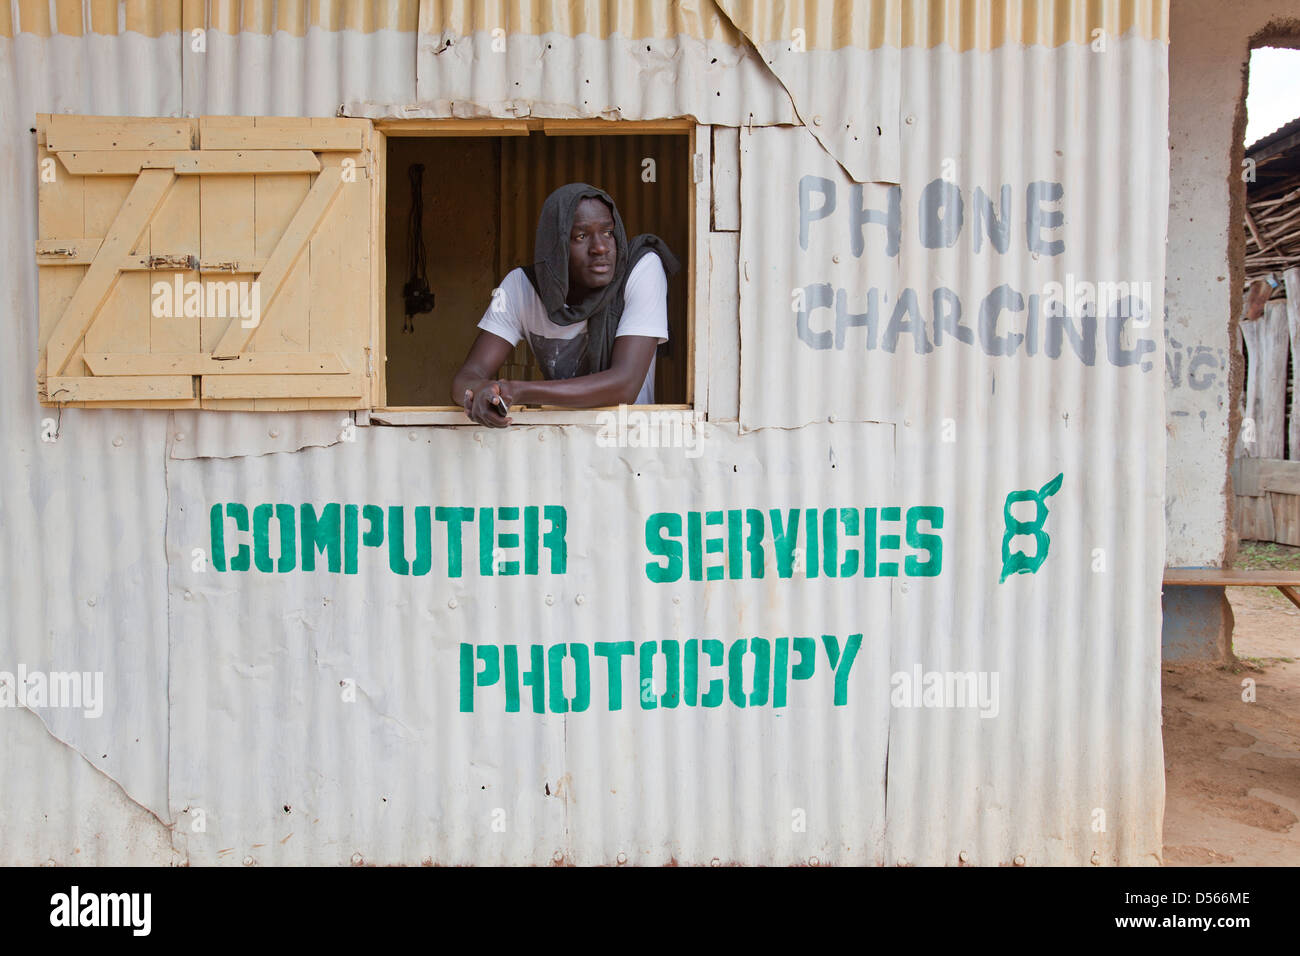 Man awaiting business in a mobile phone charging booth, Yala, Kenya. - Stock Image